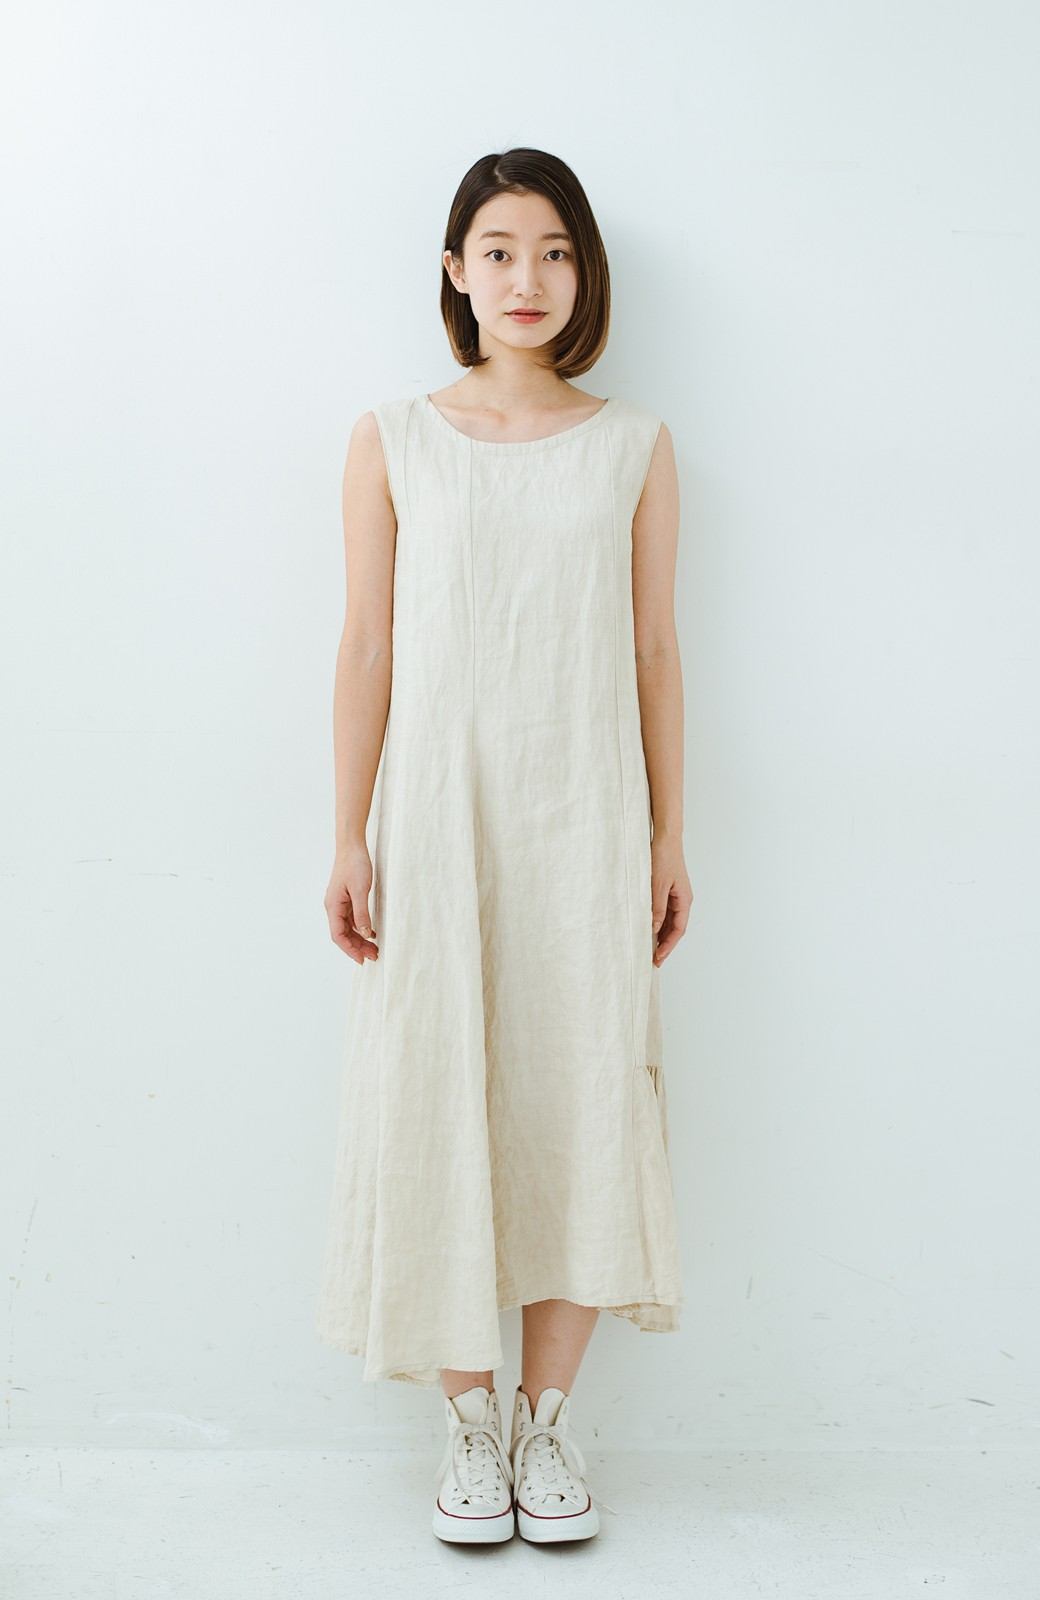 haco! てとひとて Miho Umezawa TWILL LINEN アシンメトリードレス <ライトベージュ>の商品写真8